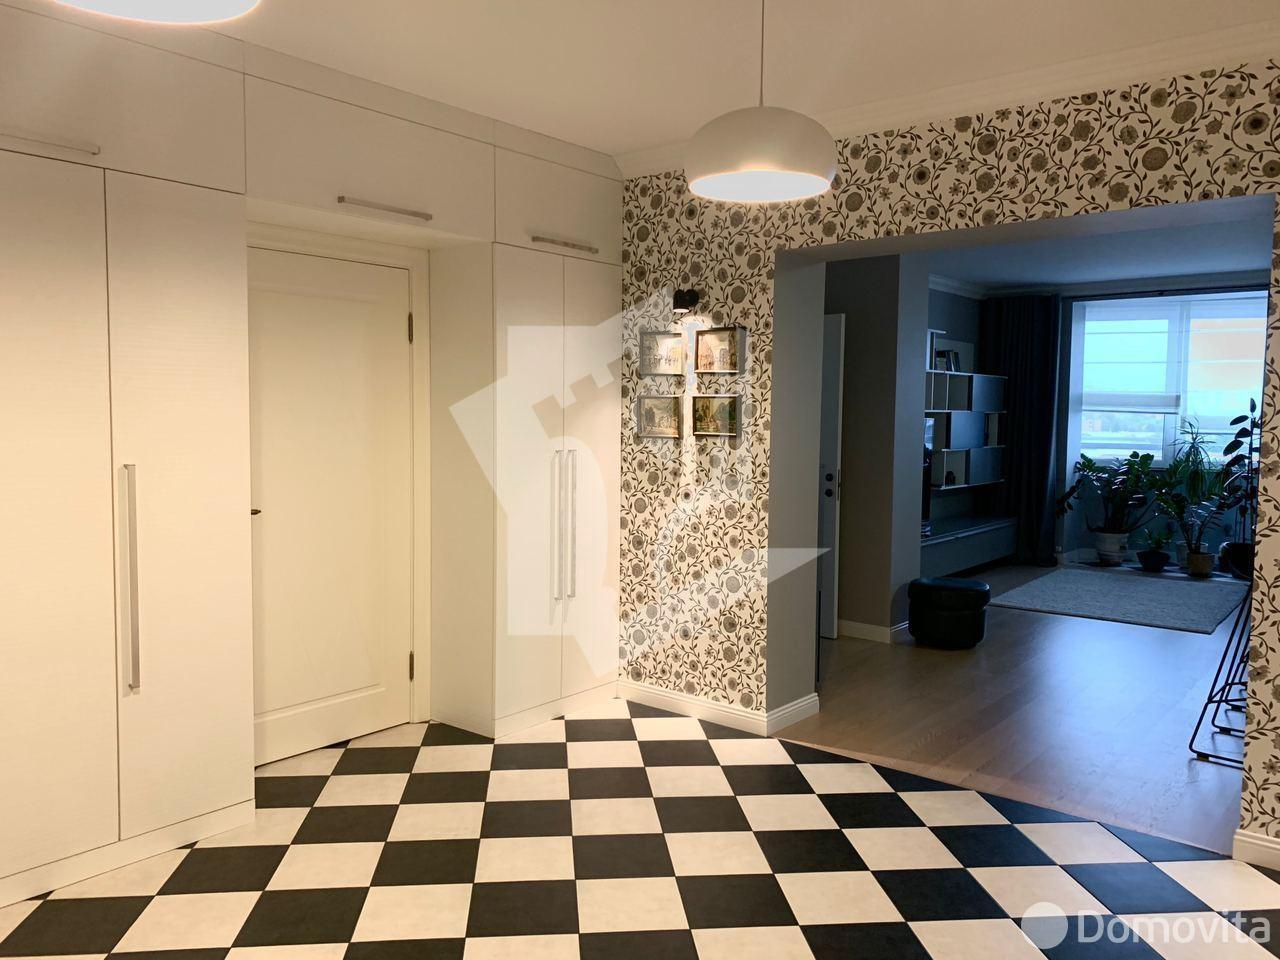 Снять 4-комнатную квартиру в Минске, ул. Скрыганова, д. 4А - фото 3